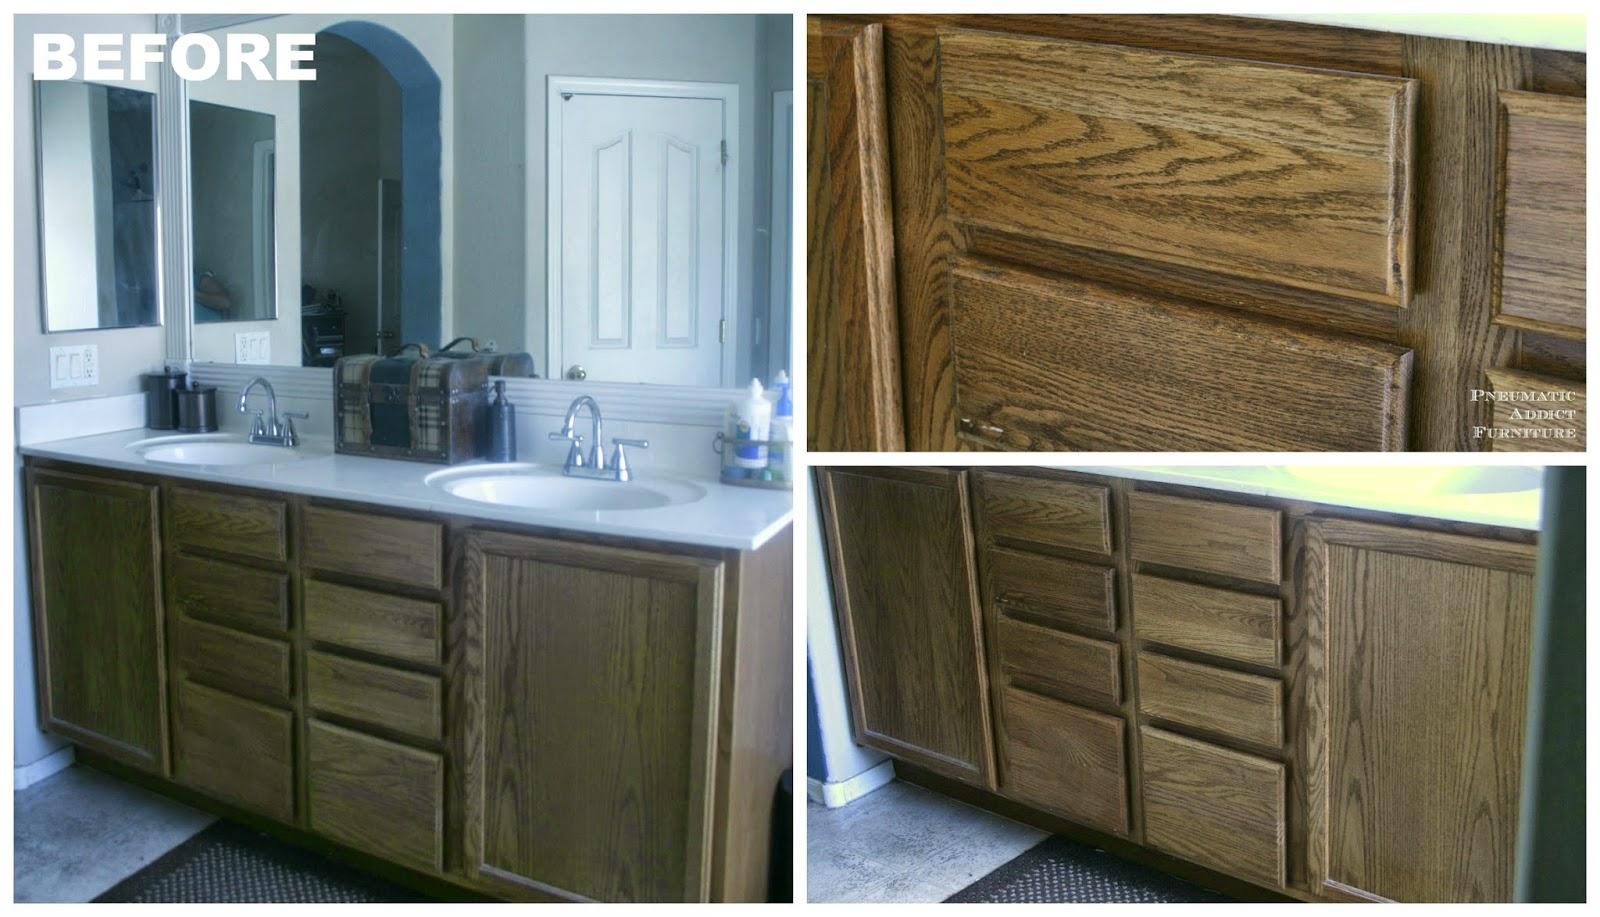 Paint Or Stain Kitchen Cabinets Wall Murals Refinish Oak Darker Roselawnlutheran